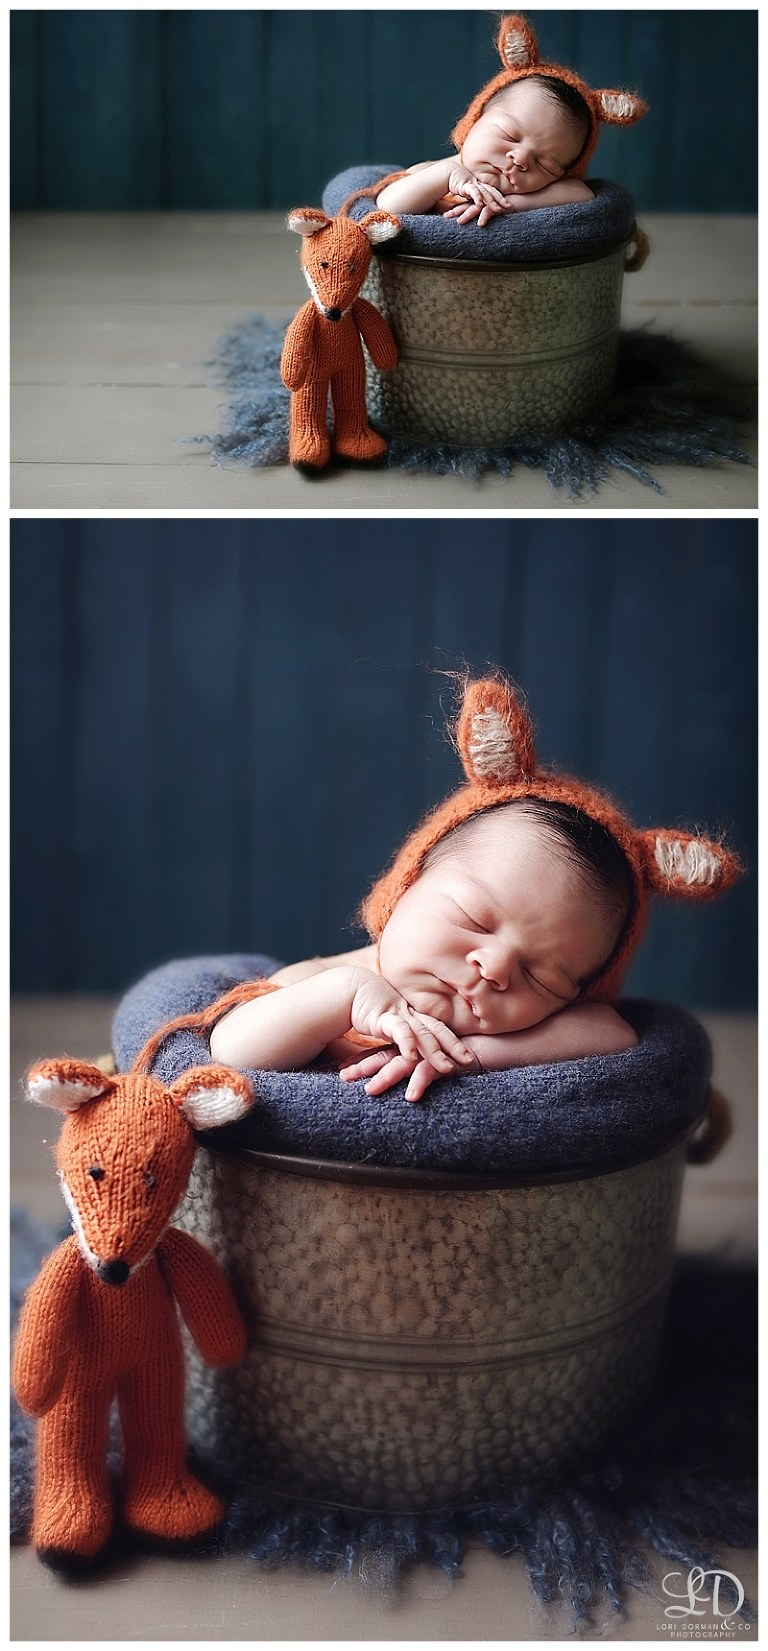 sweet maternity photoshoot-lori dorman photography-maternity boudoir-professional photographer_2119.jpg